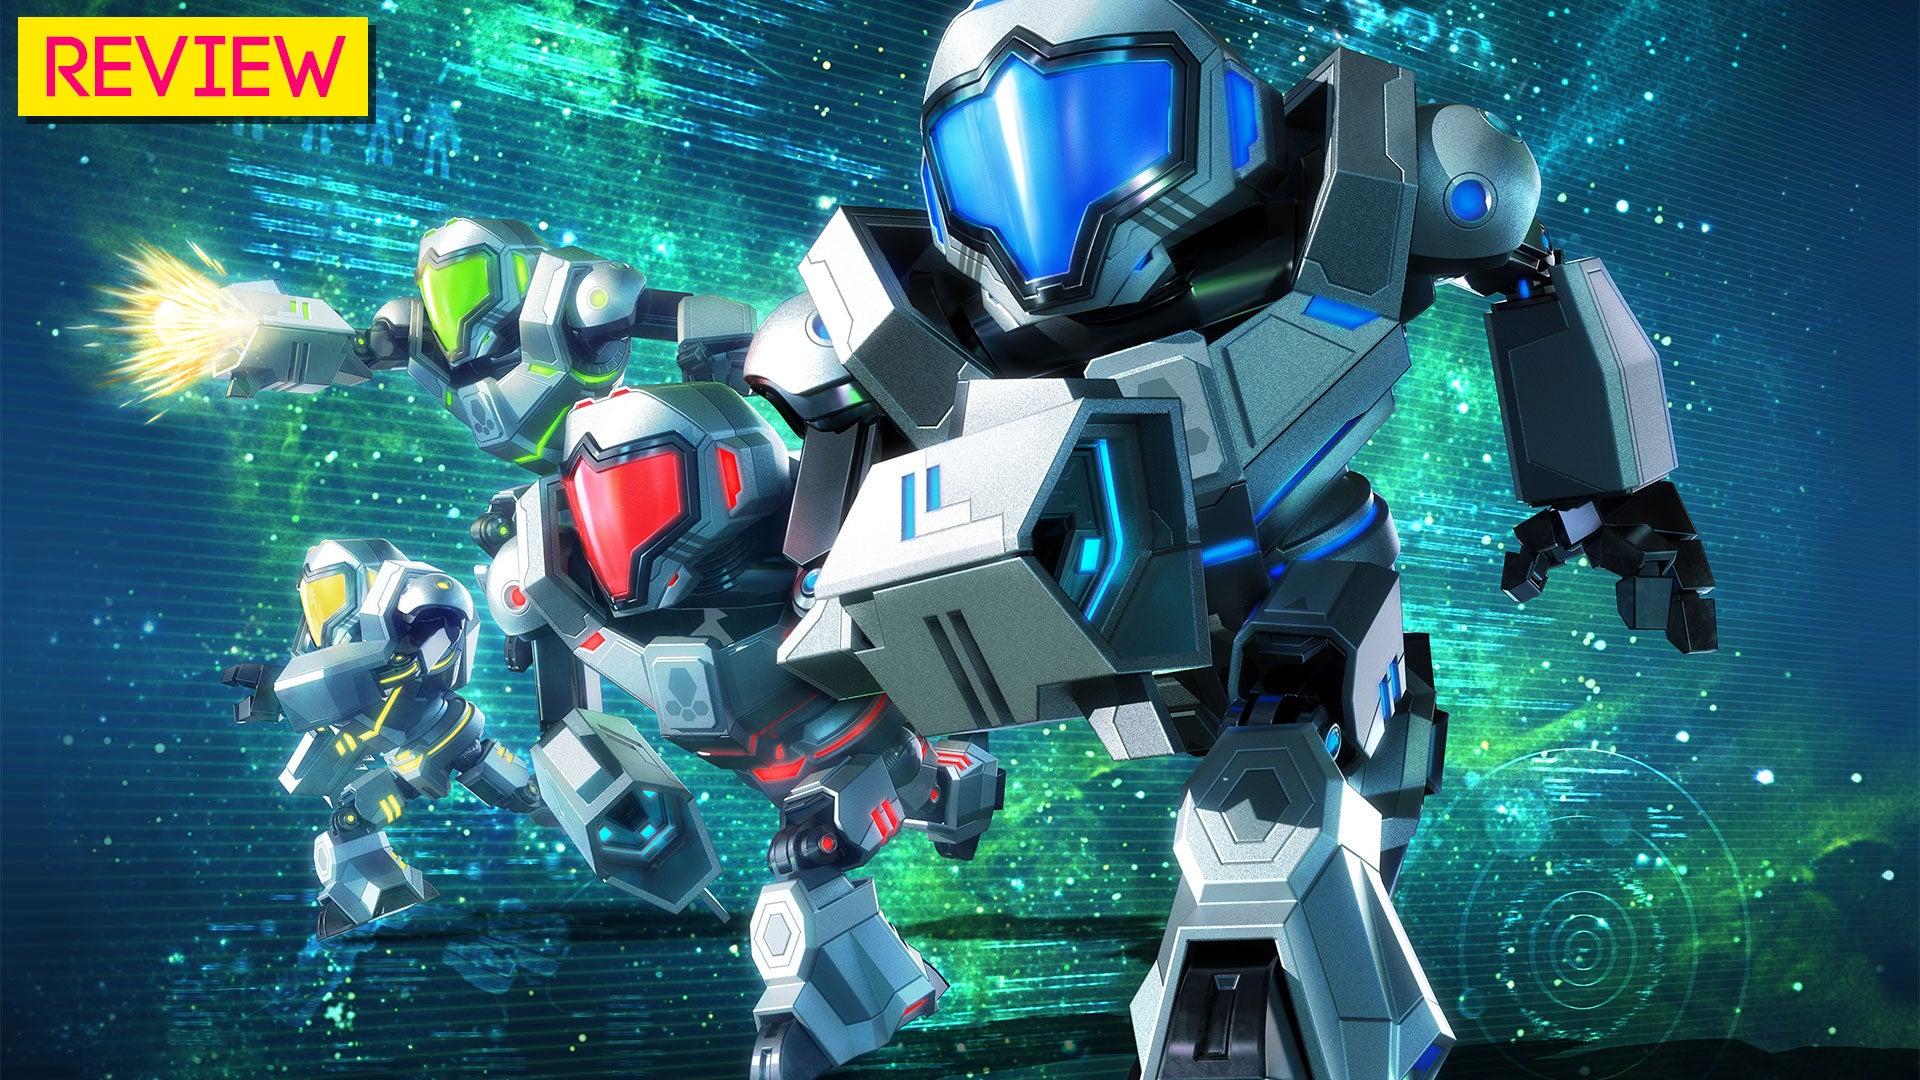 Metroid Prime: Federation Force: The Kotaku Review